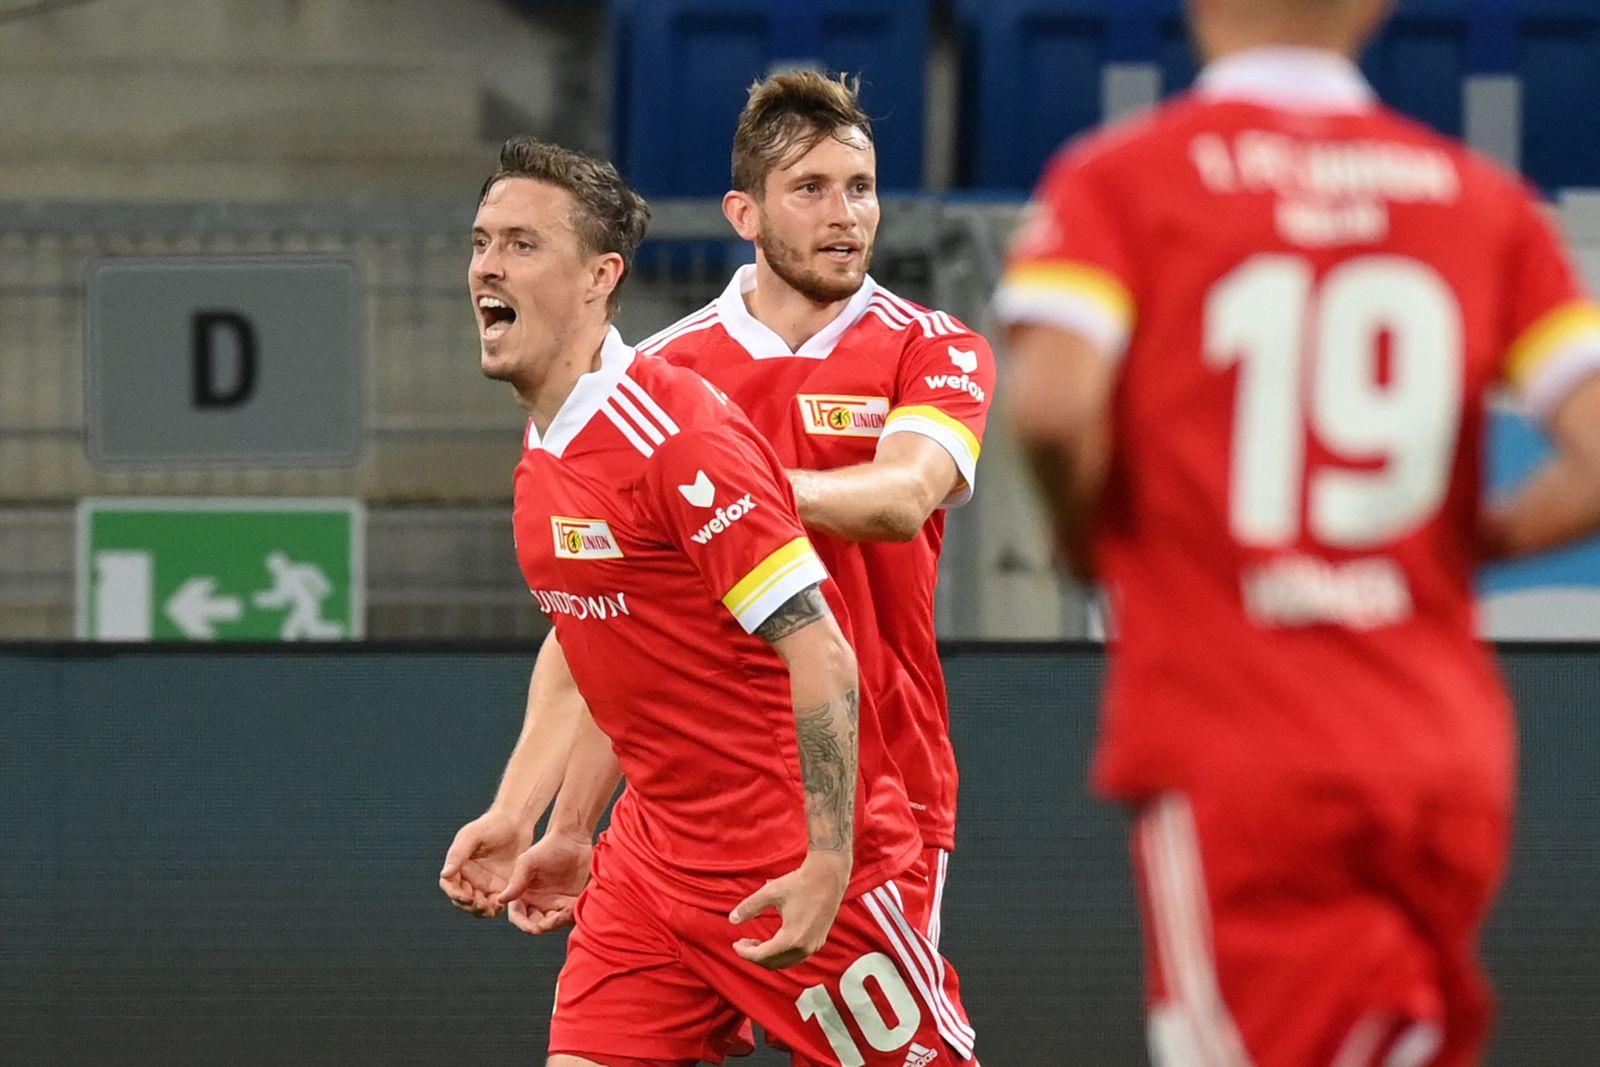 TSG Hoffenheim v 1. FC Union Berlin - Bundesliga